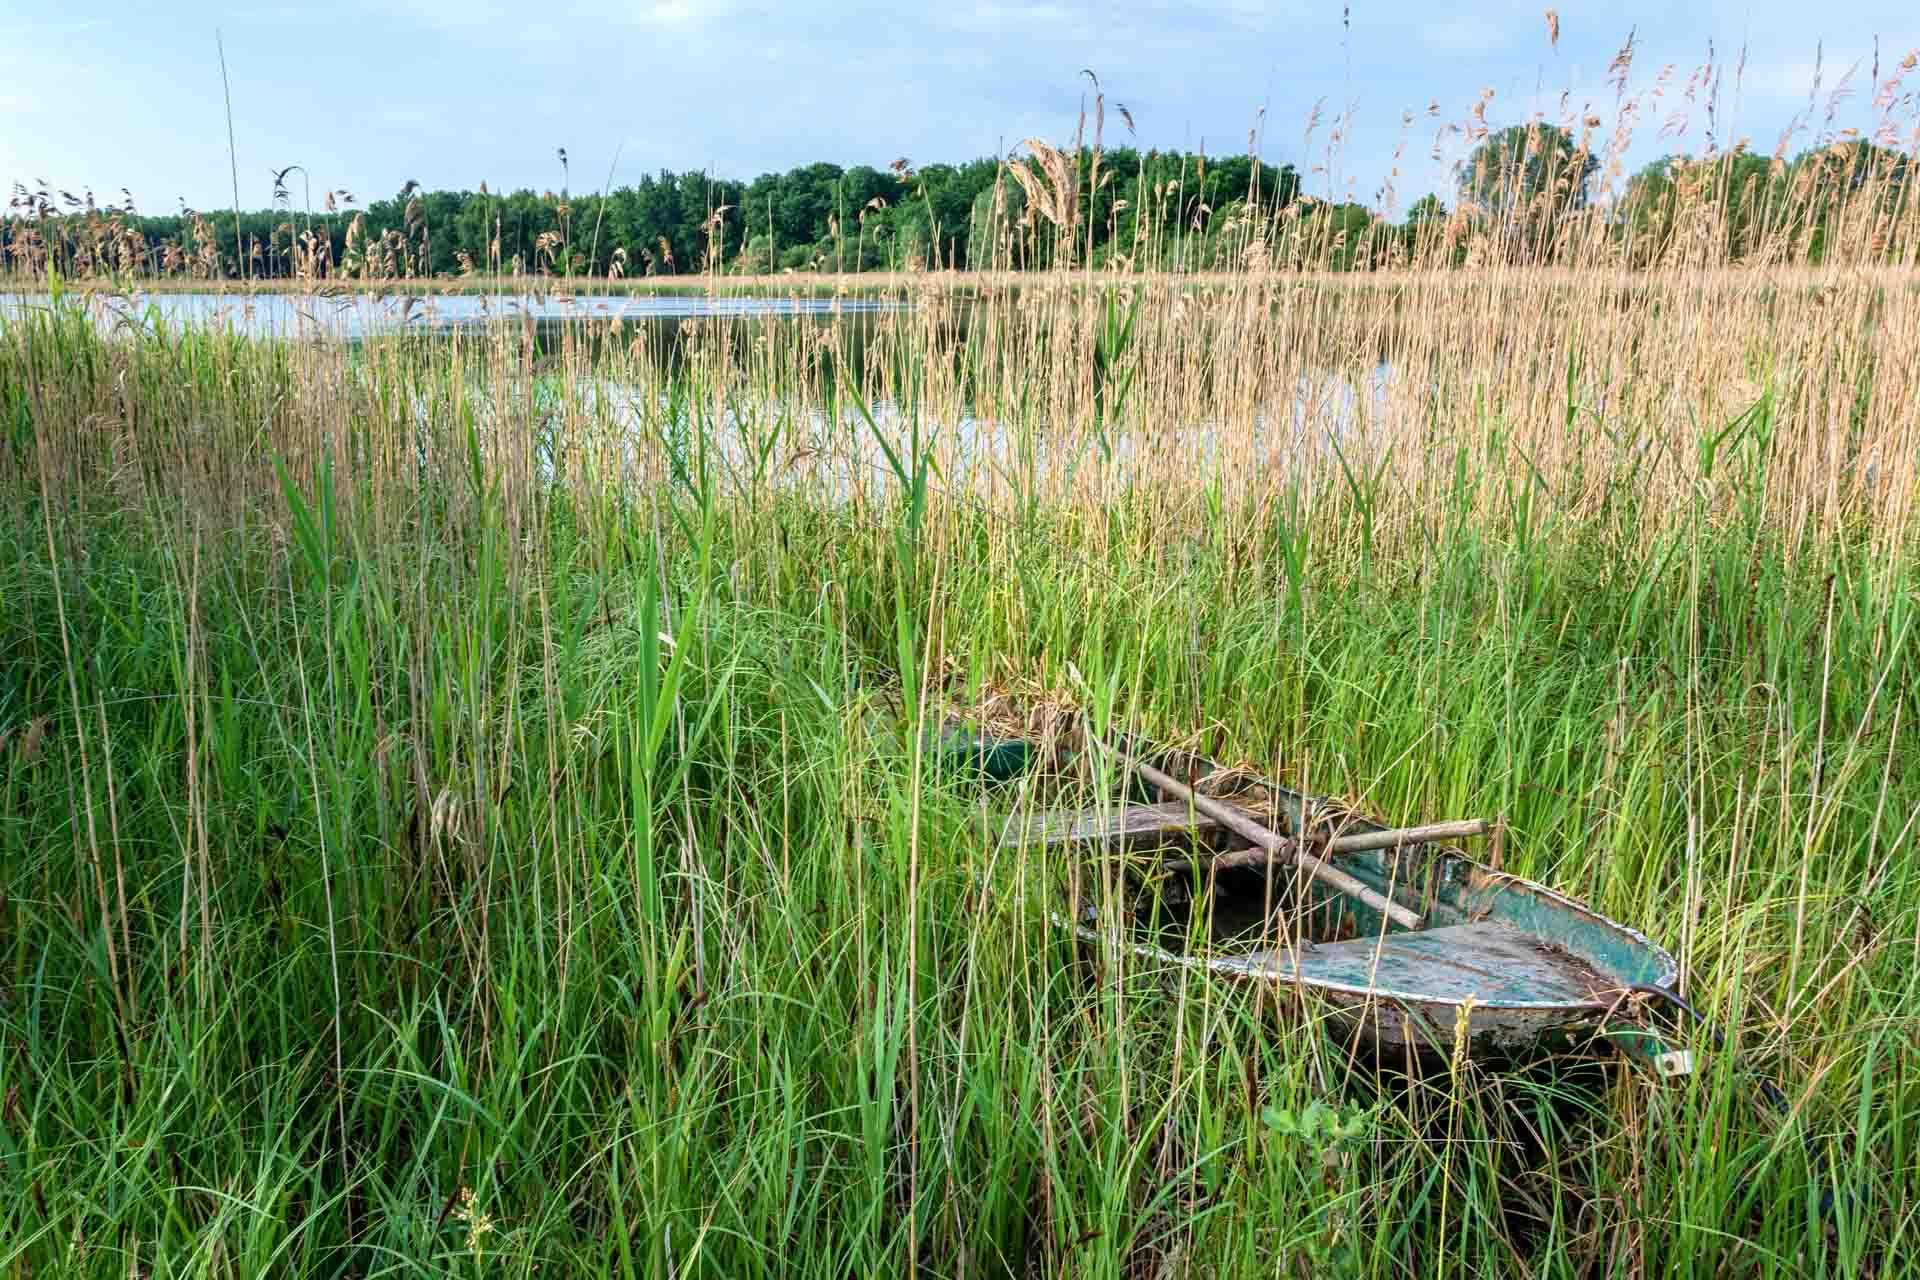 Lac de Madine © PhotoGranary - AdobeStock